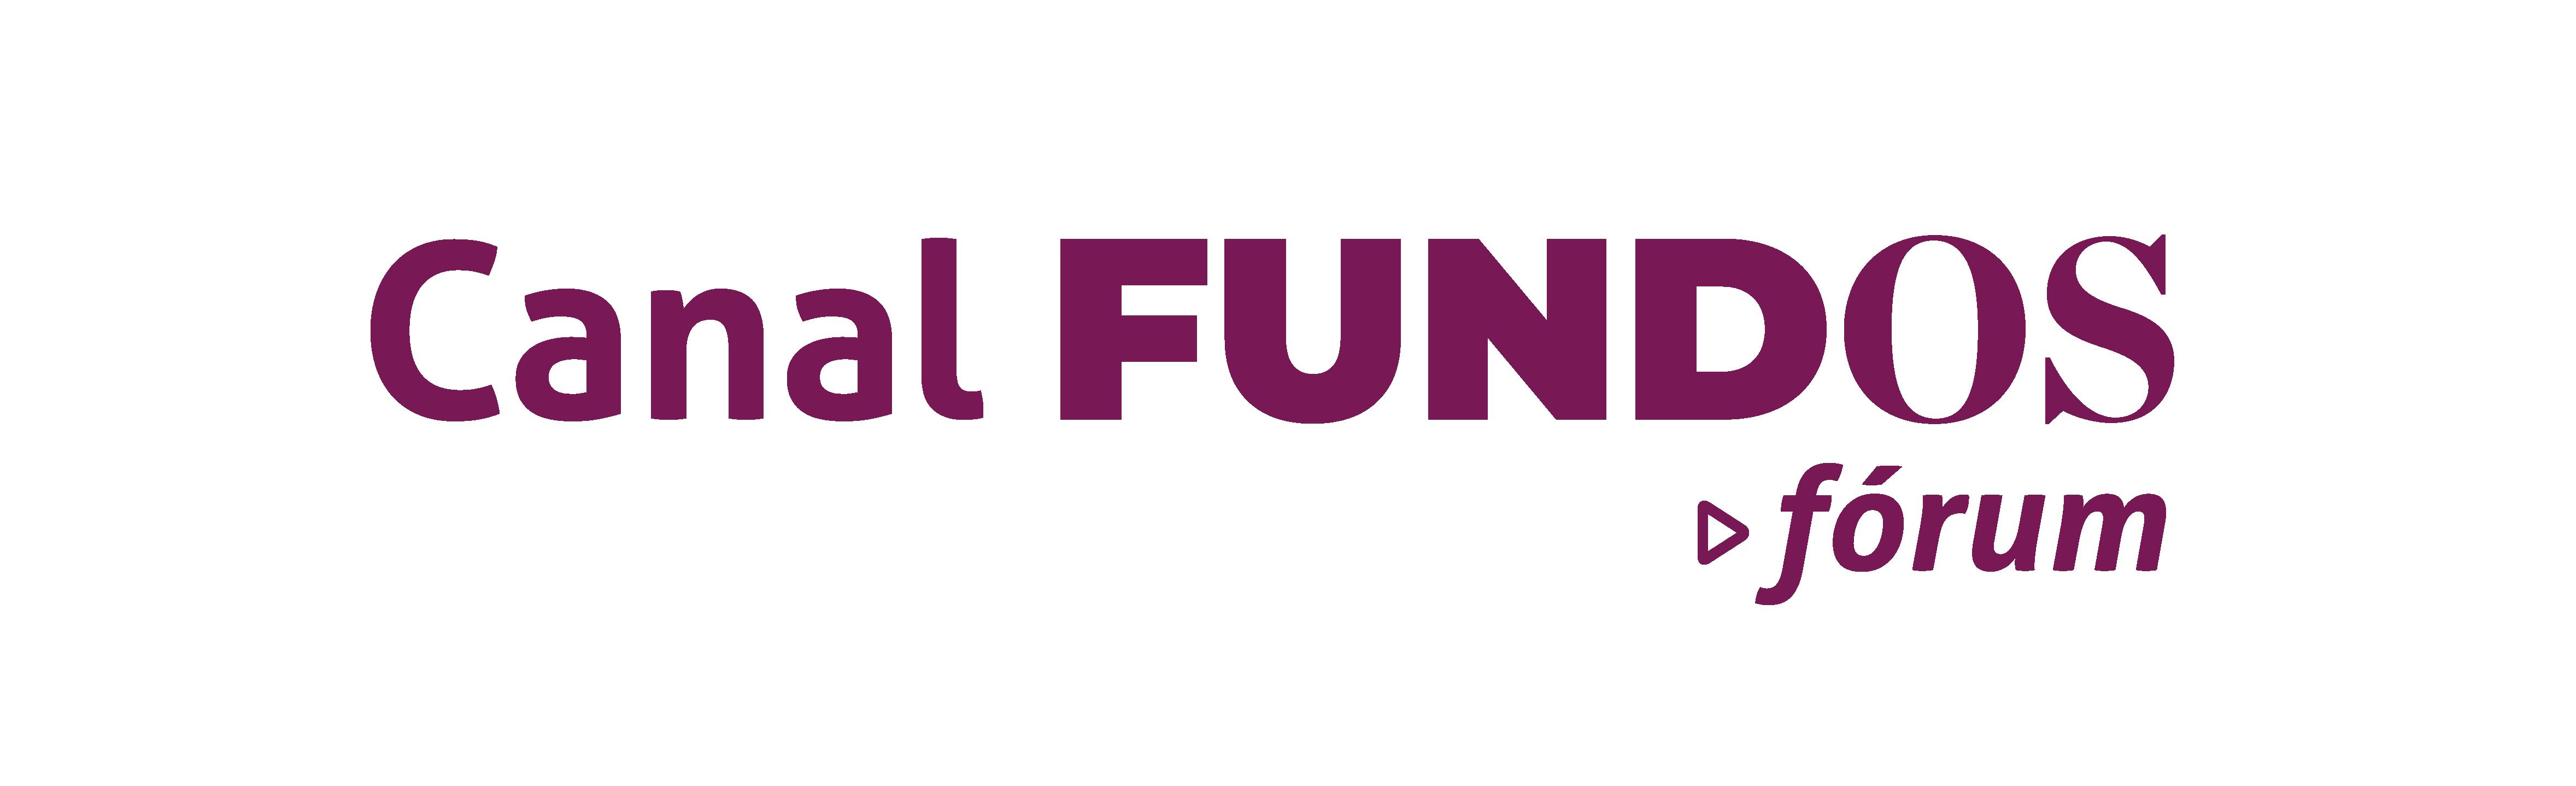 Fundos Forum